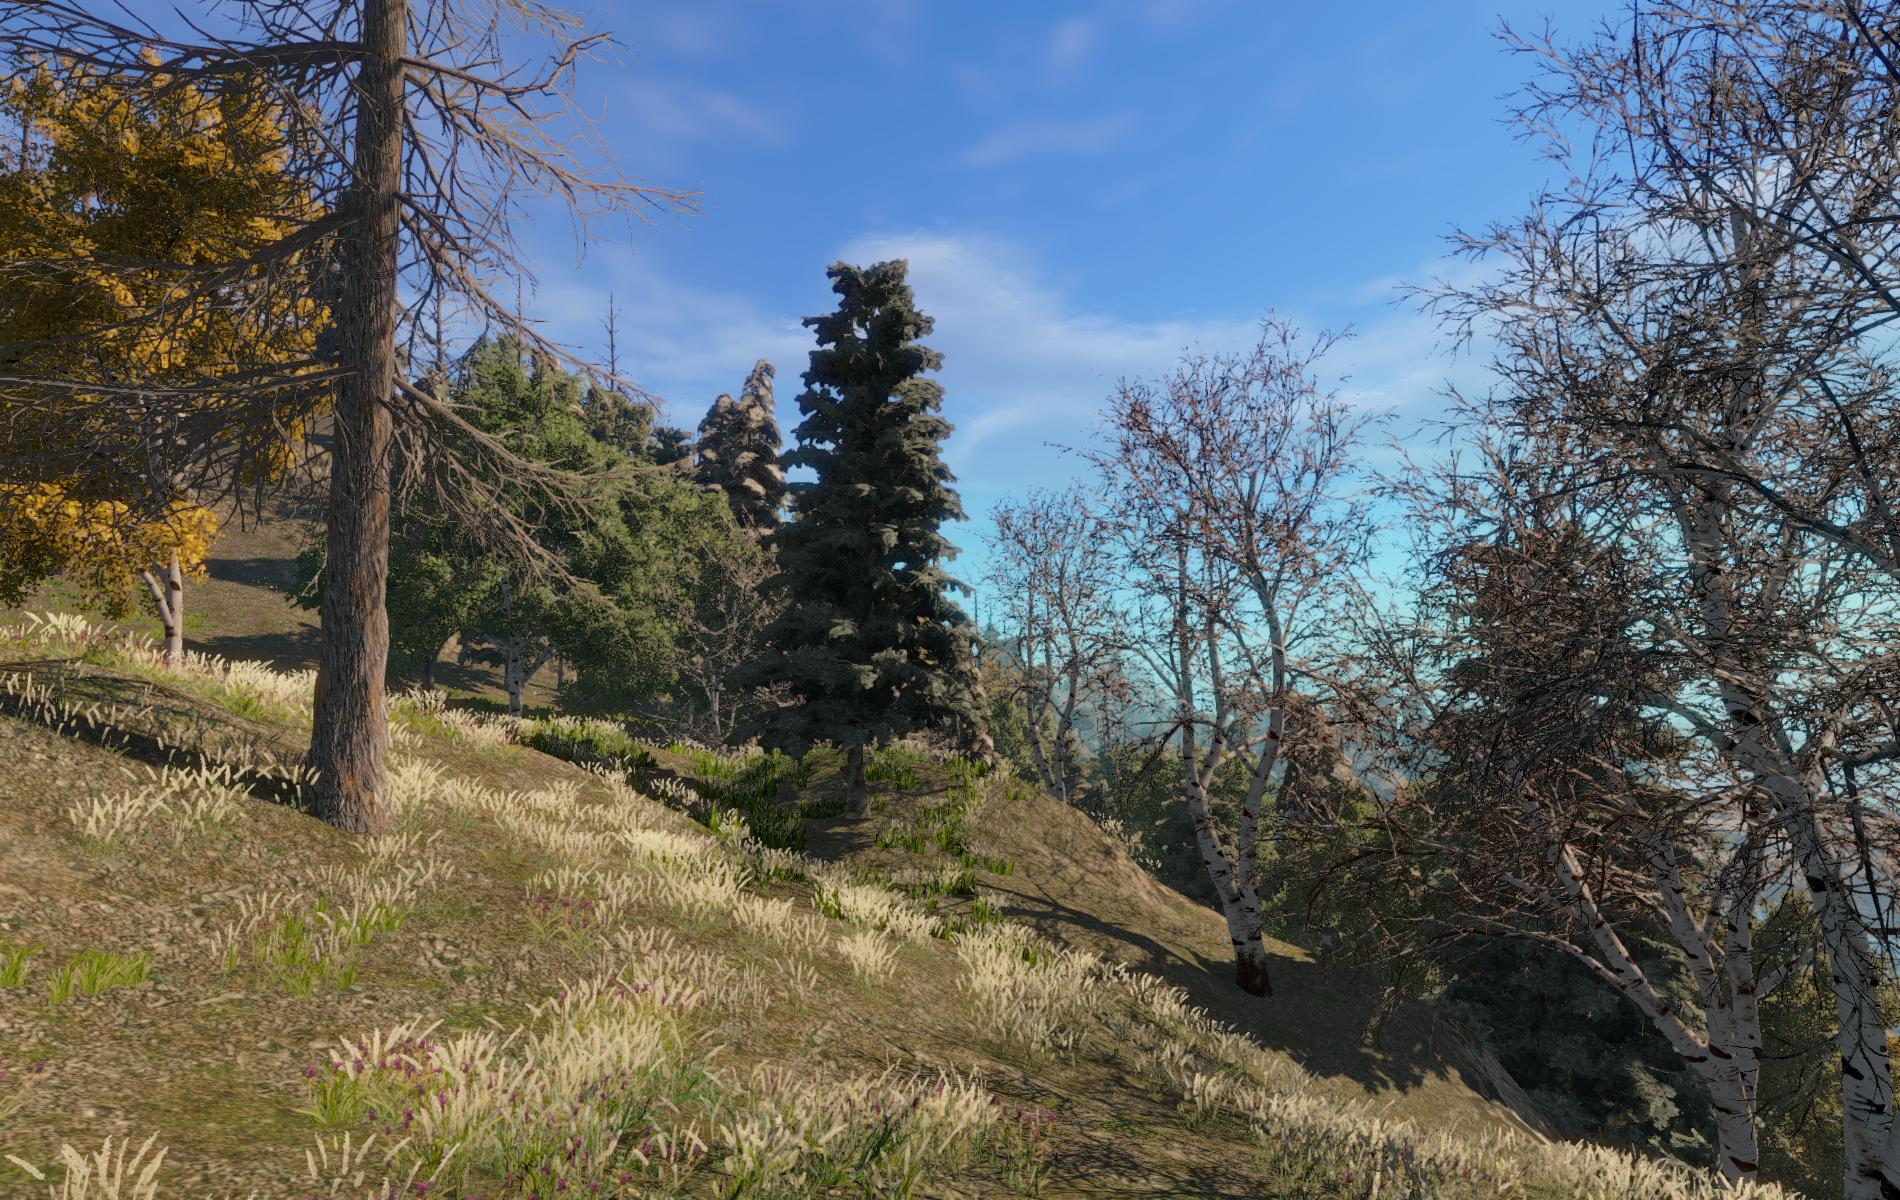 GAIA - AAA terrain generator, procedural texturing, planting and